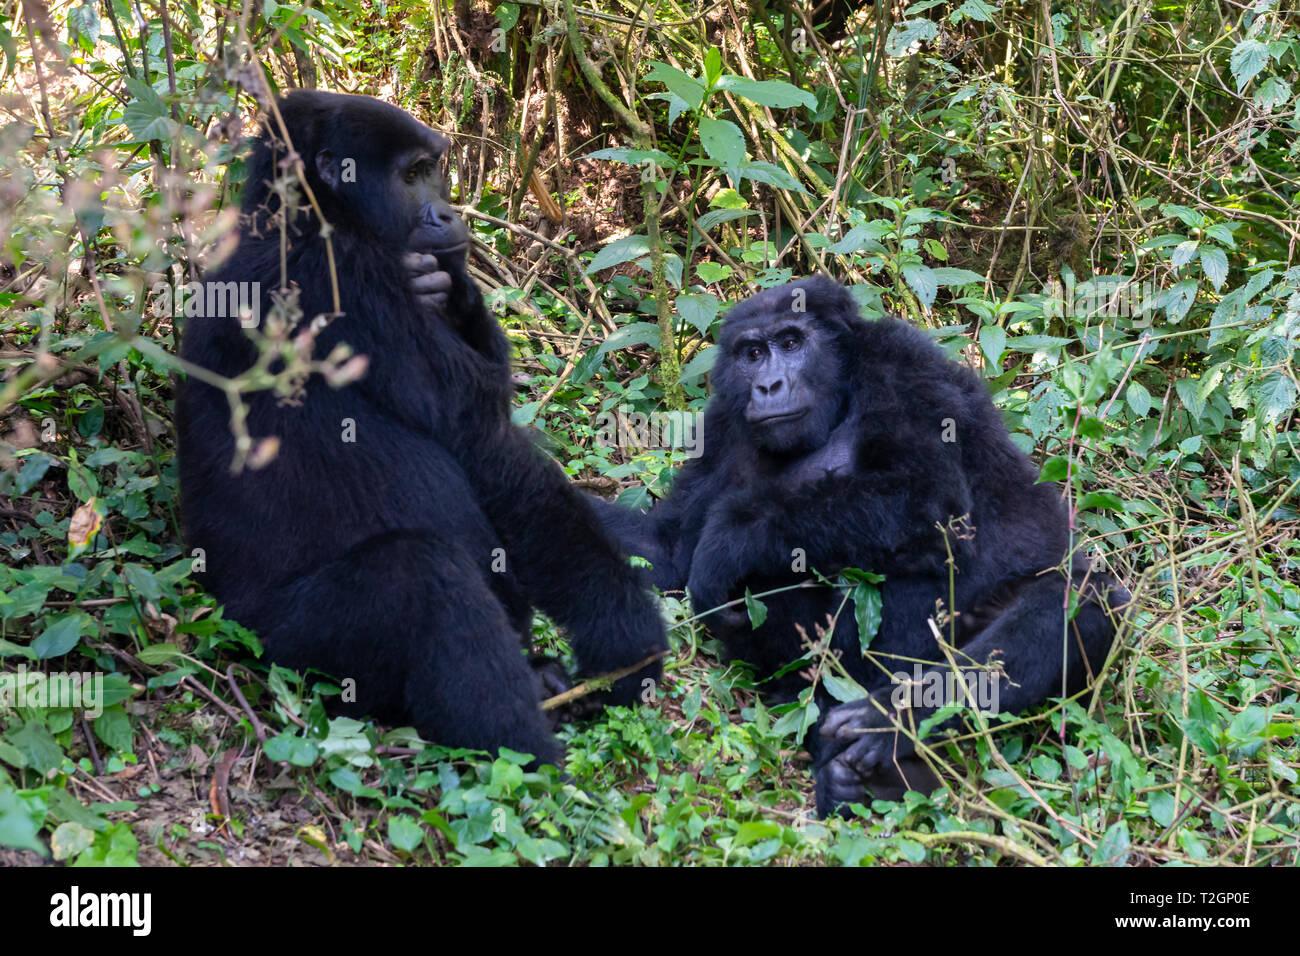 Female Mountain Gorillas (Gorilla beringei beringei) holding hands in Bwindi Impenetrable Forest National Park in South West Uganda, East Africa - Stock Image